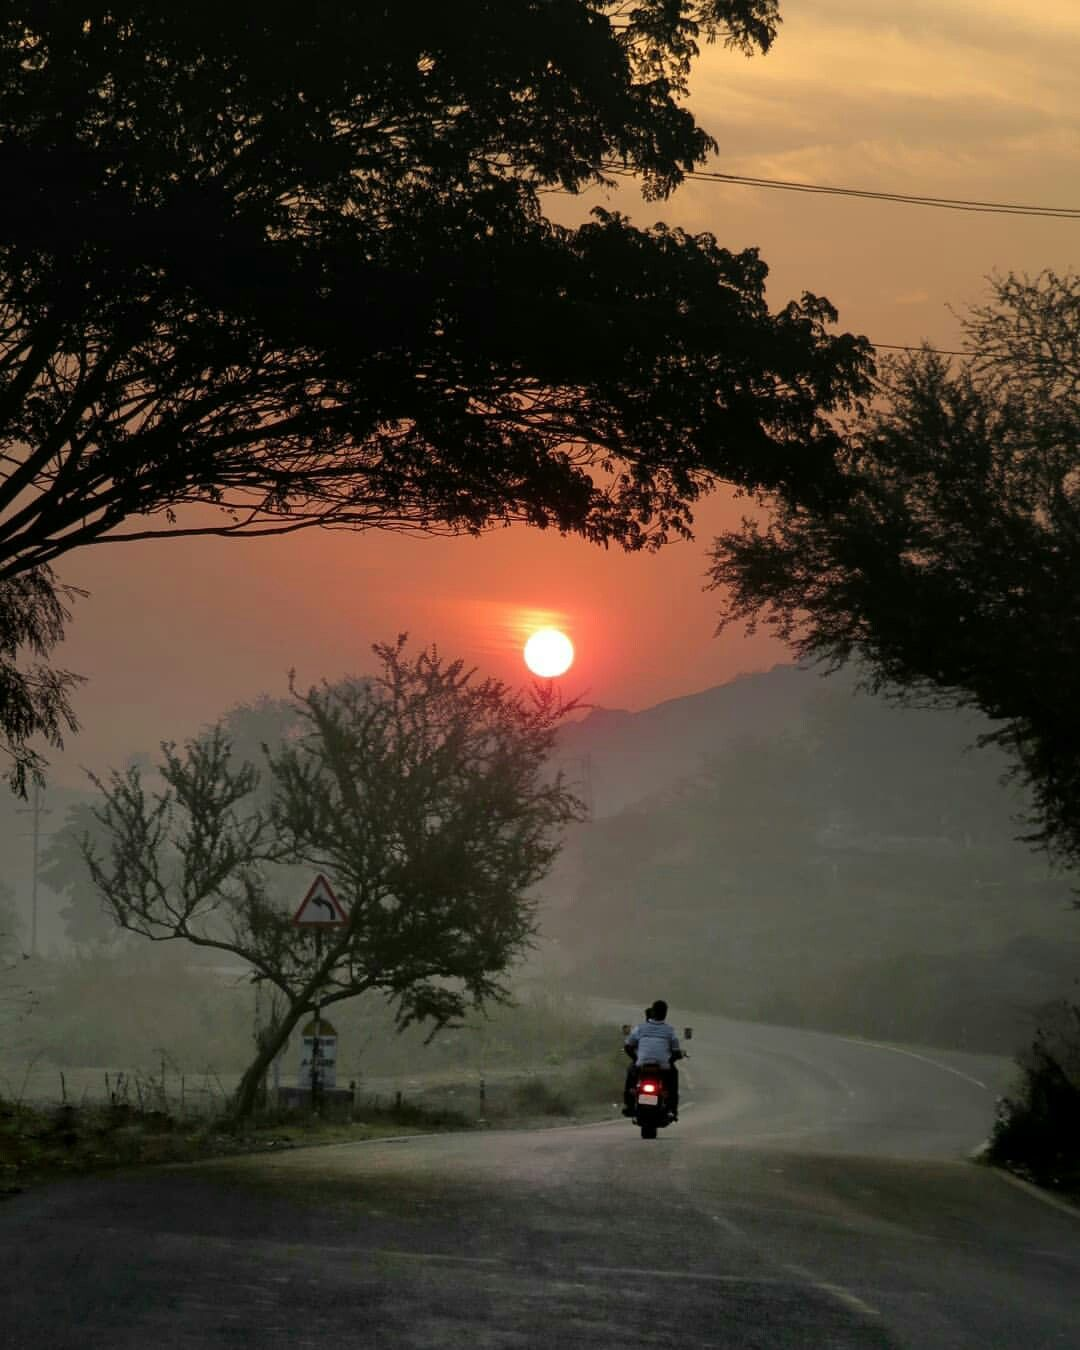 Pin By Appa Jadhav On Sun Photography Nature Photography Nature Images Nature Pictures